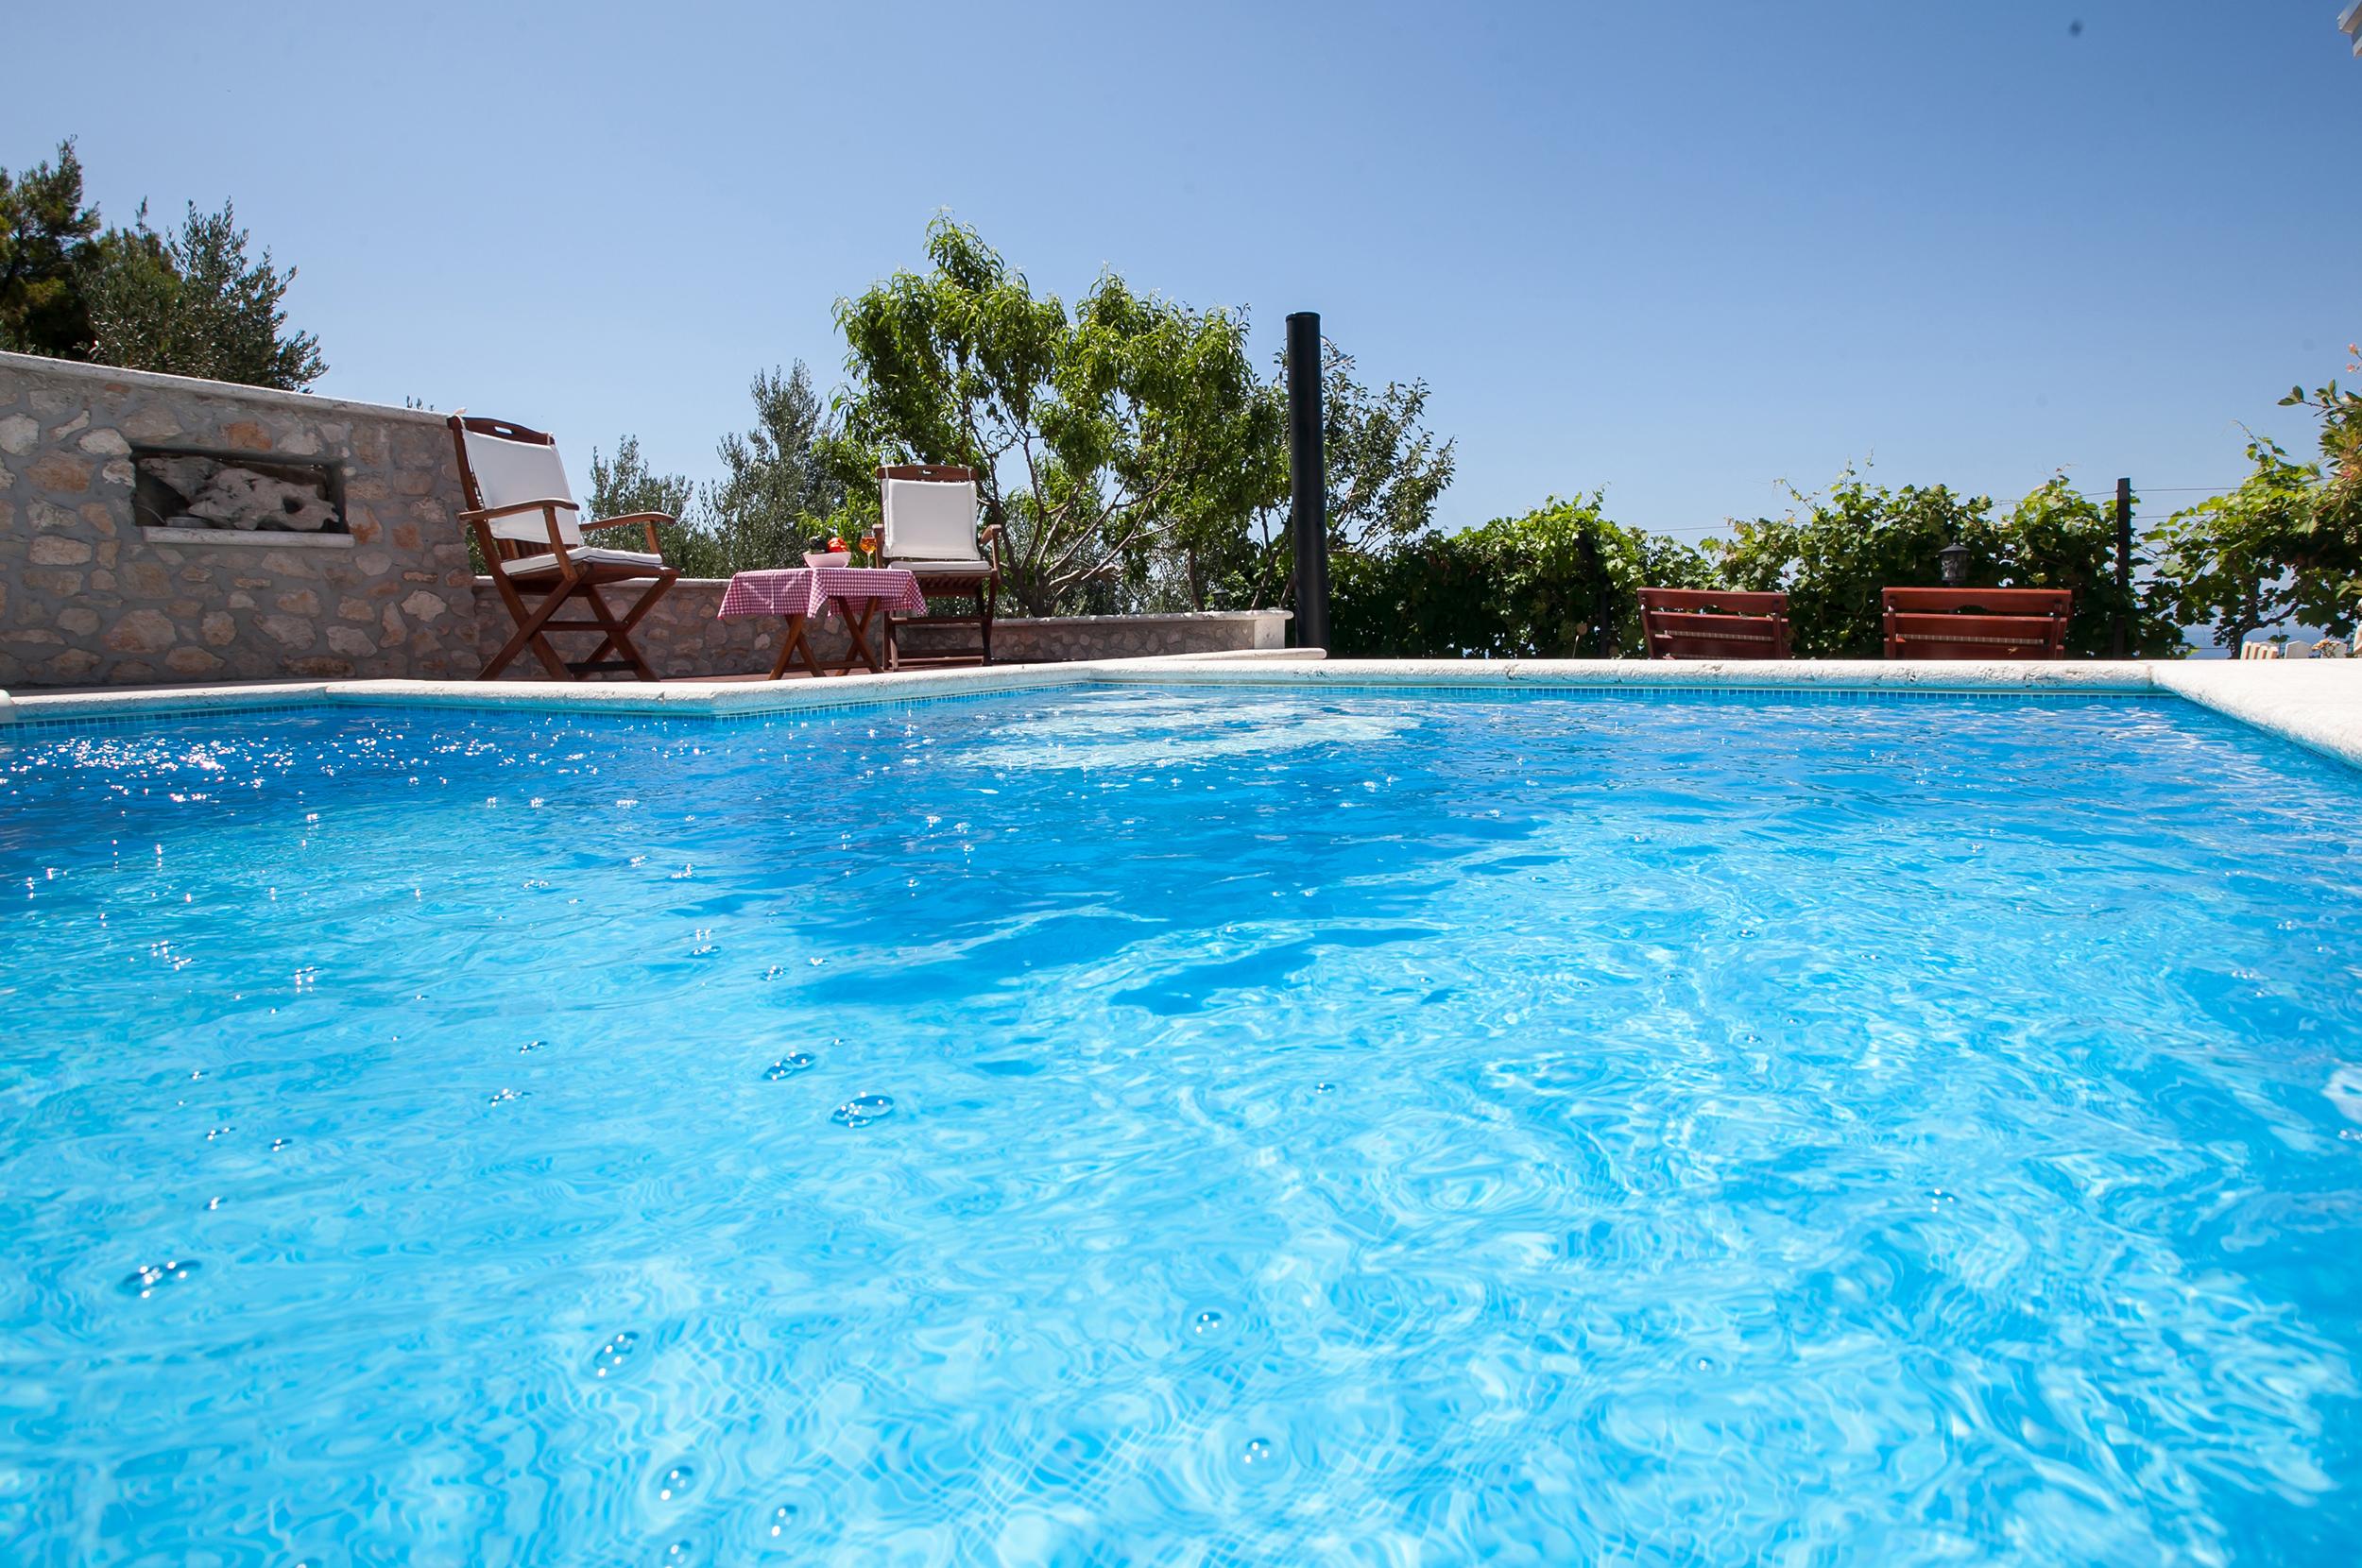 6a ferienhaus dalmatien mit pool villa dalmatia with pool and sea view. Black Bedroom Furniture Sets. Home Design Ideas